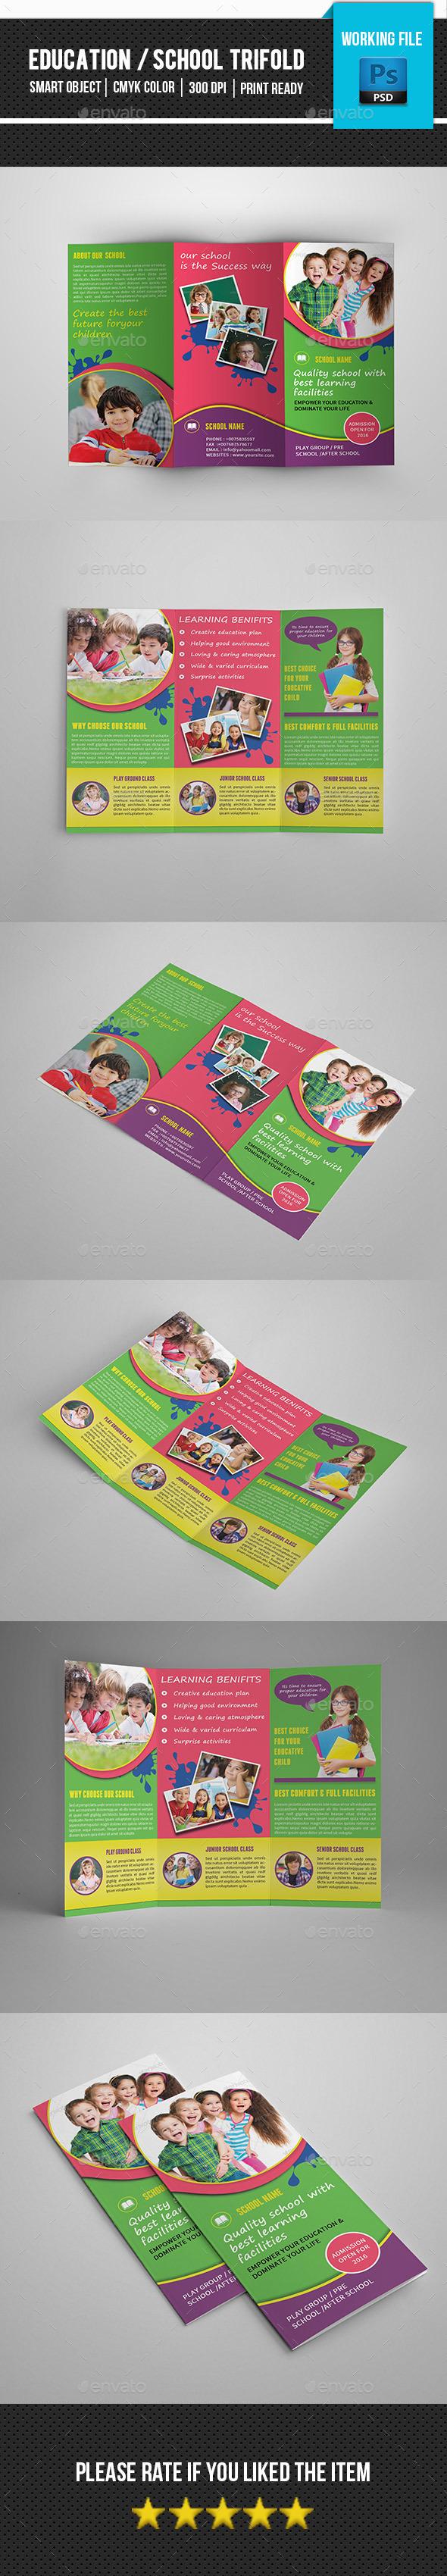 Kids School Trifold Brochure-V269 - Corporate Brochures